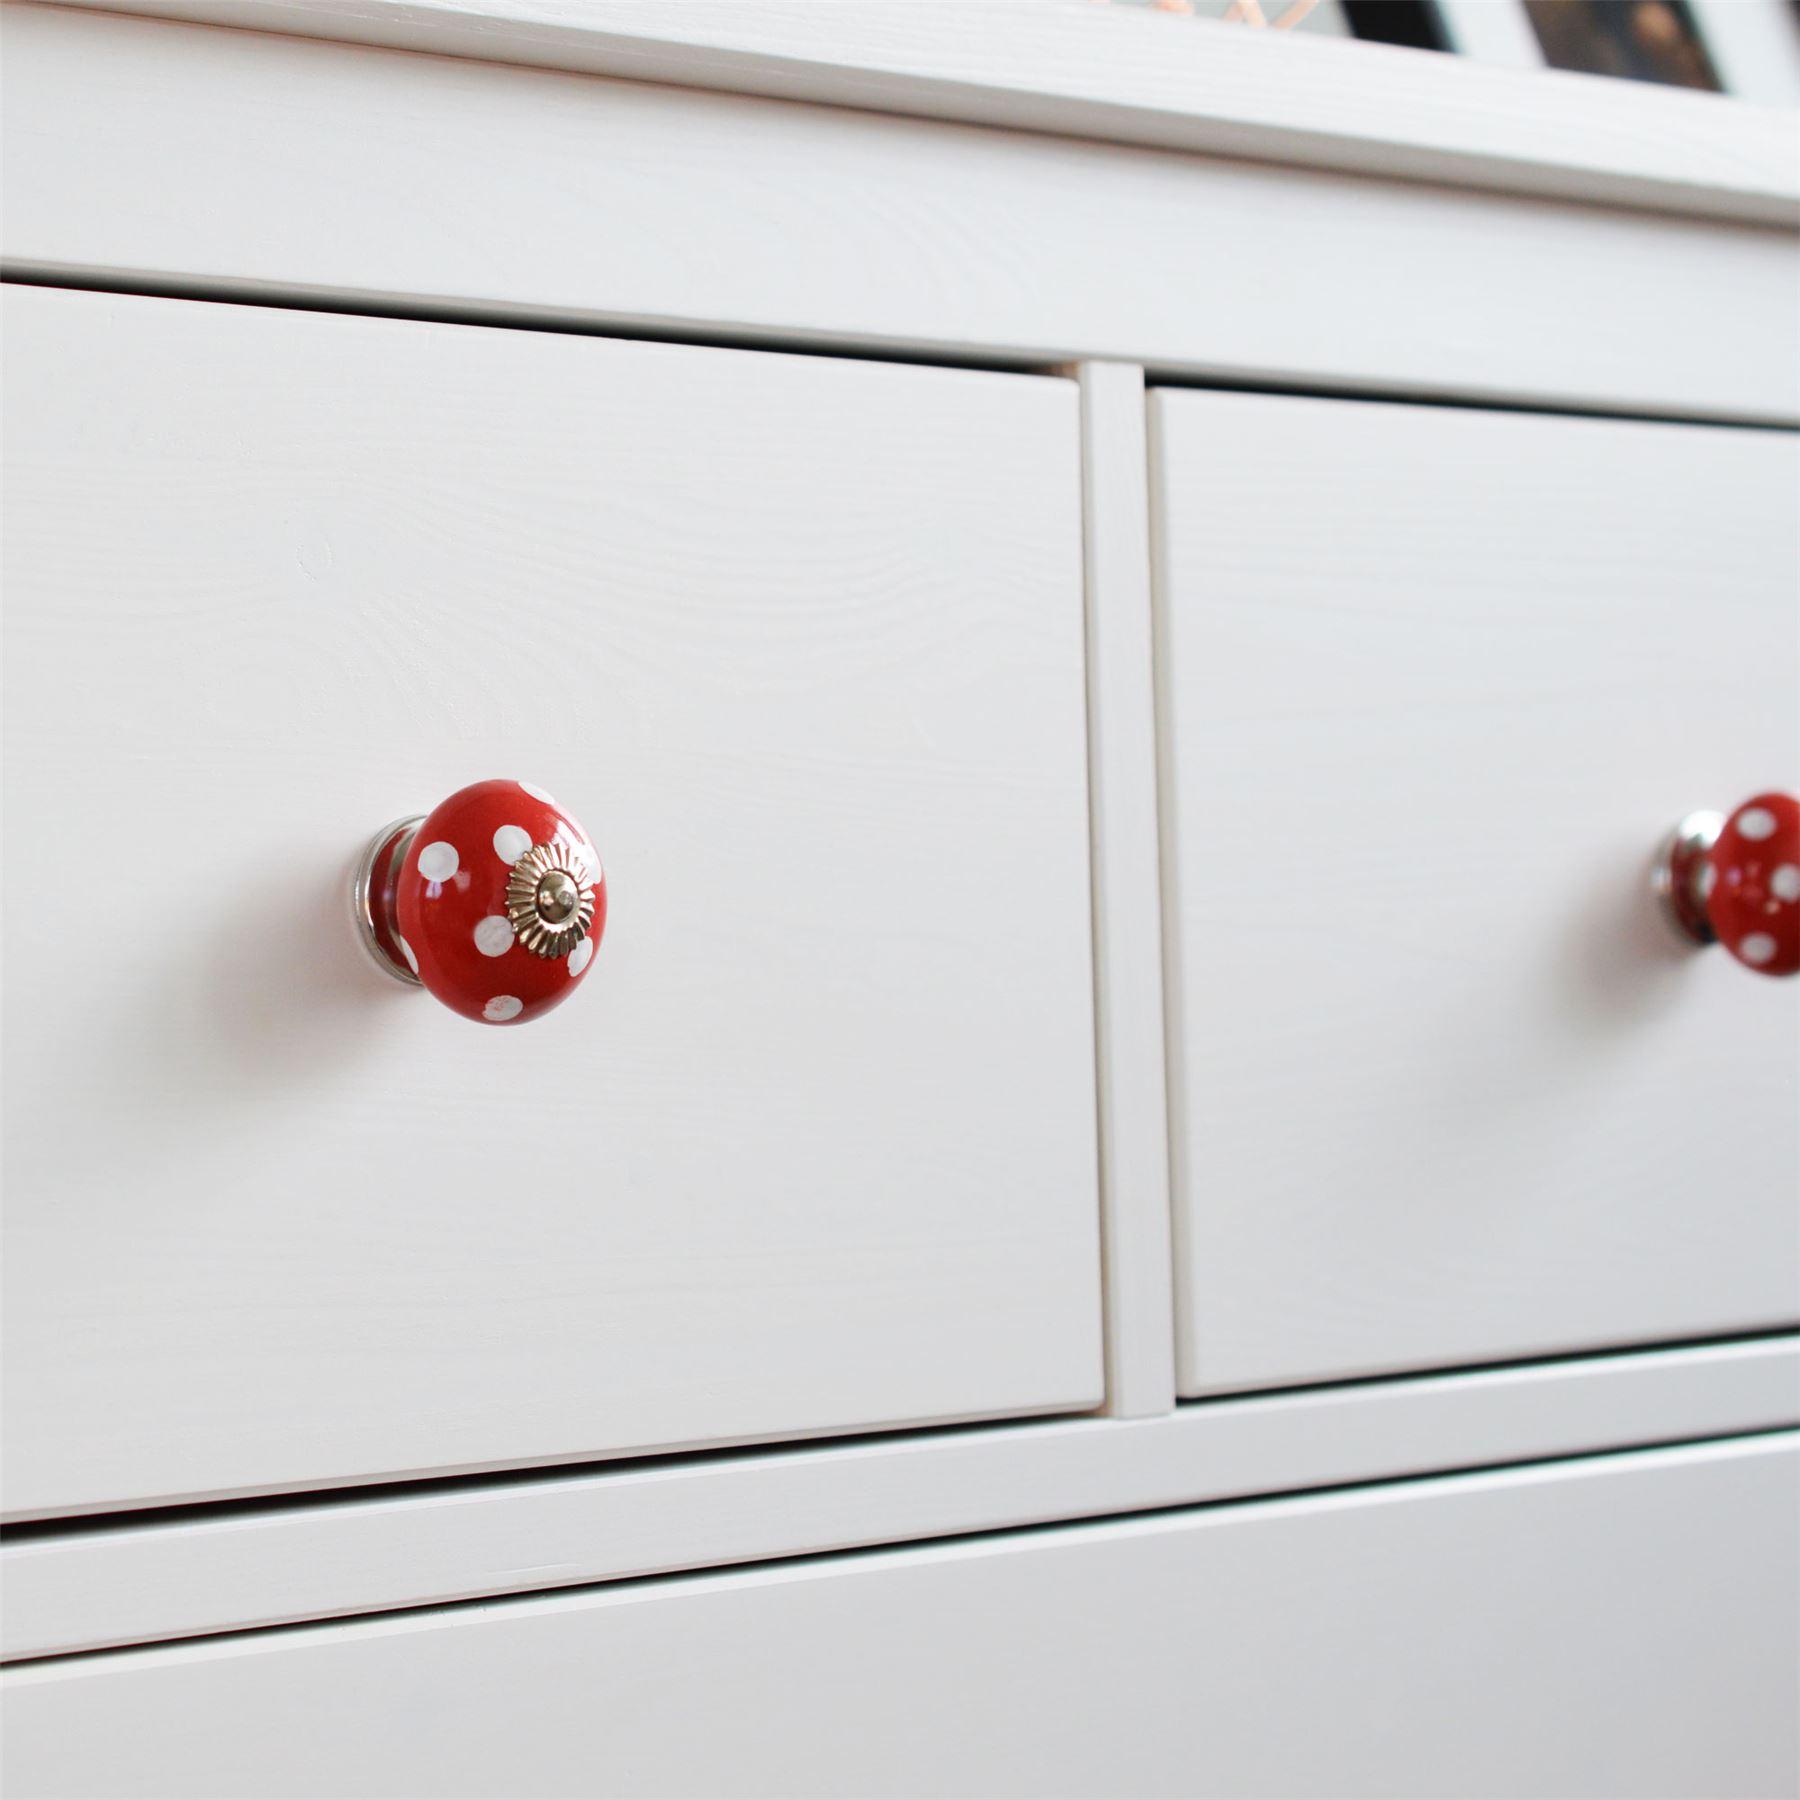 x12 White//Red Polka Dot Ceramic Door Knobs Cabinet Drawer Handle Set